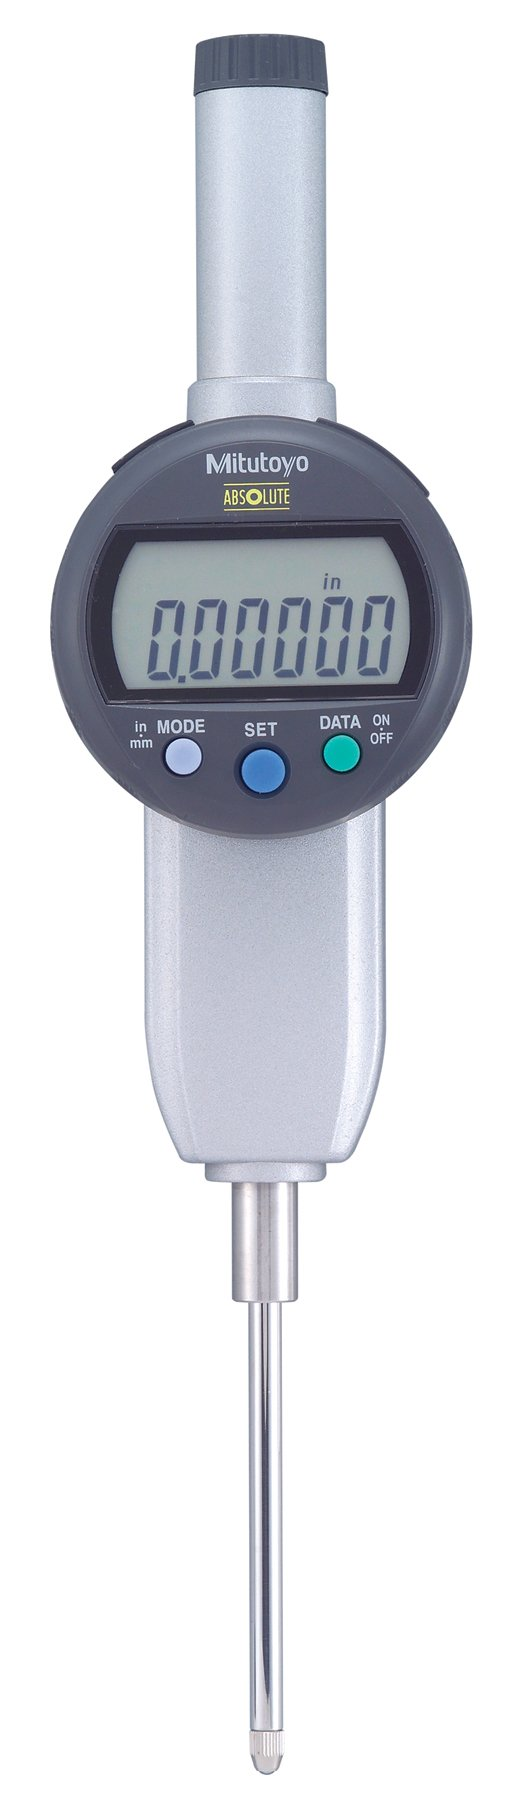 Mitutoyo 543-492B, IDC Digimatic Indicator, .00005''/.0001''/.0005''/0.001mm/0.01mm X 2'', 3/8'' Stem, Flat Back